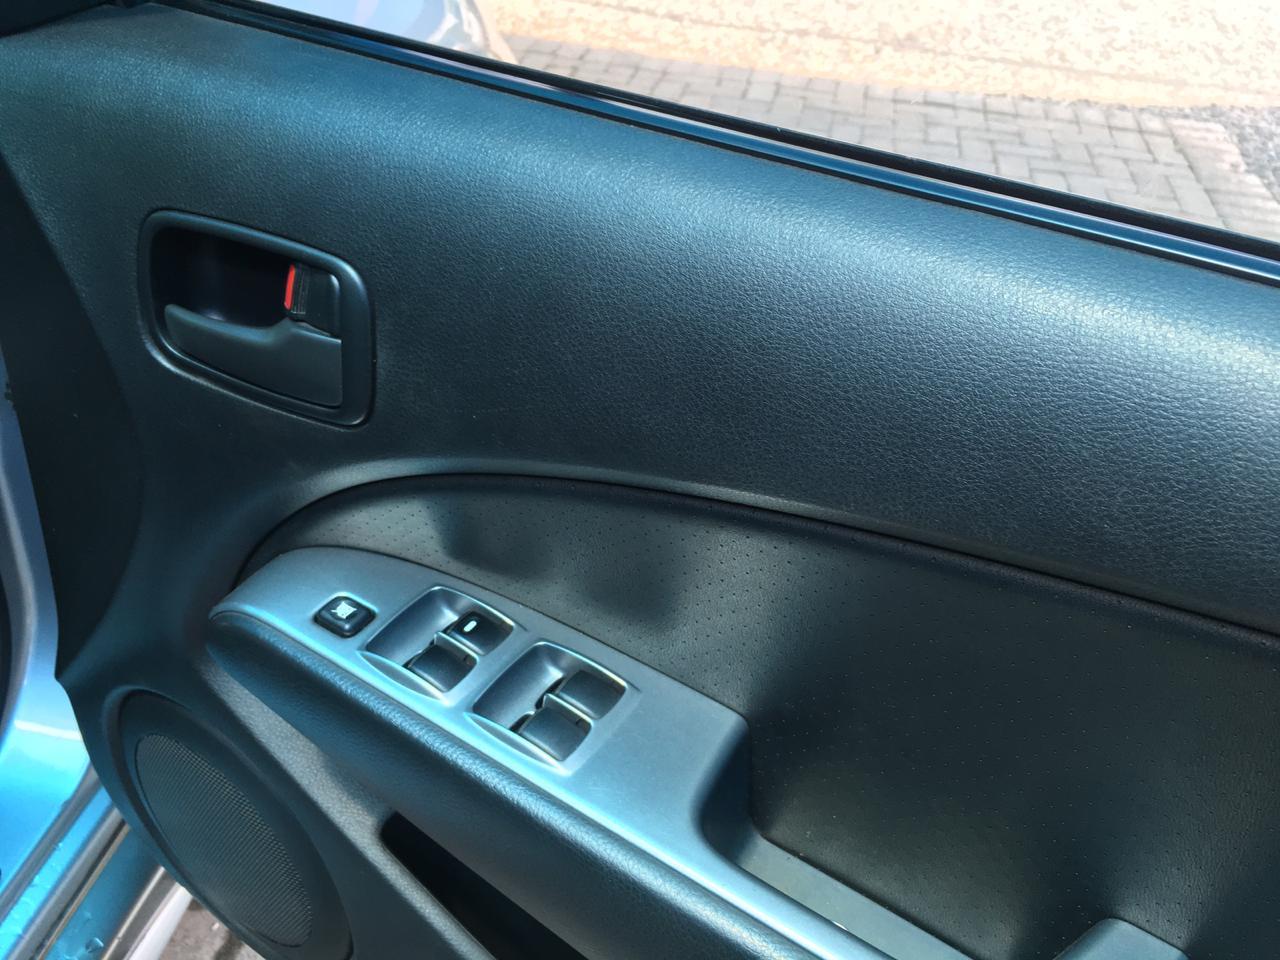 2005 Mitsubishi Outlander 2.4 GLX